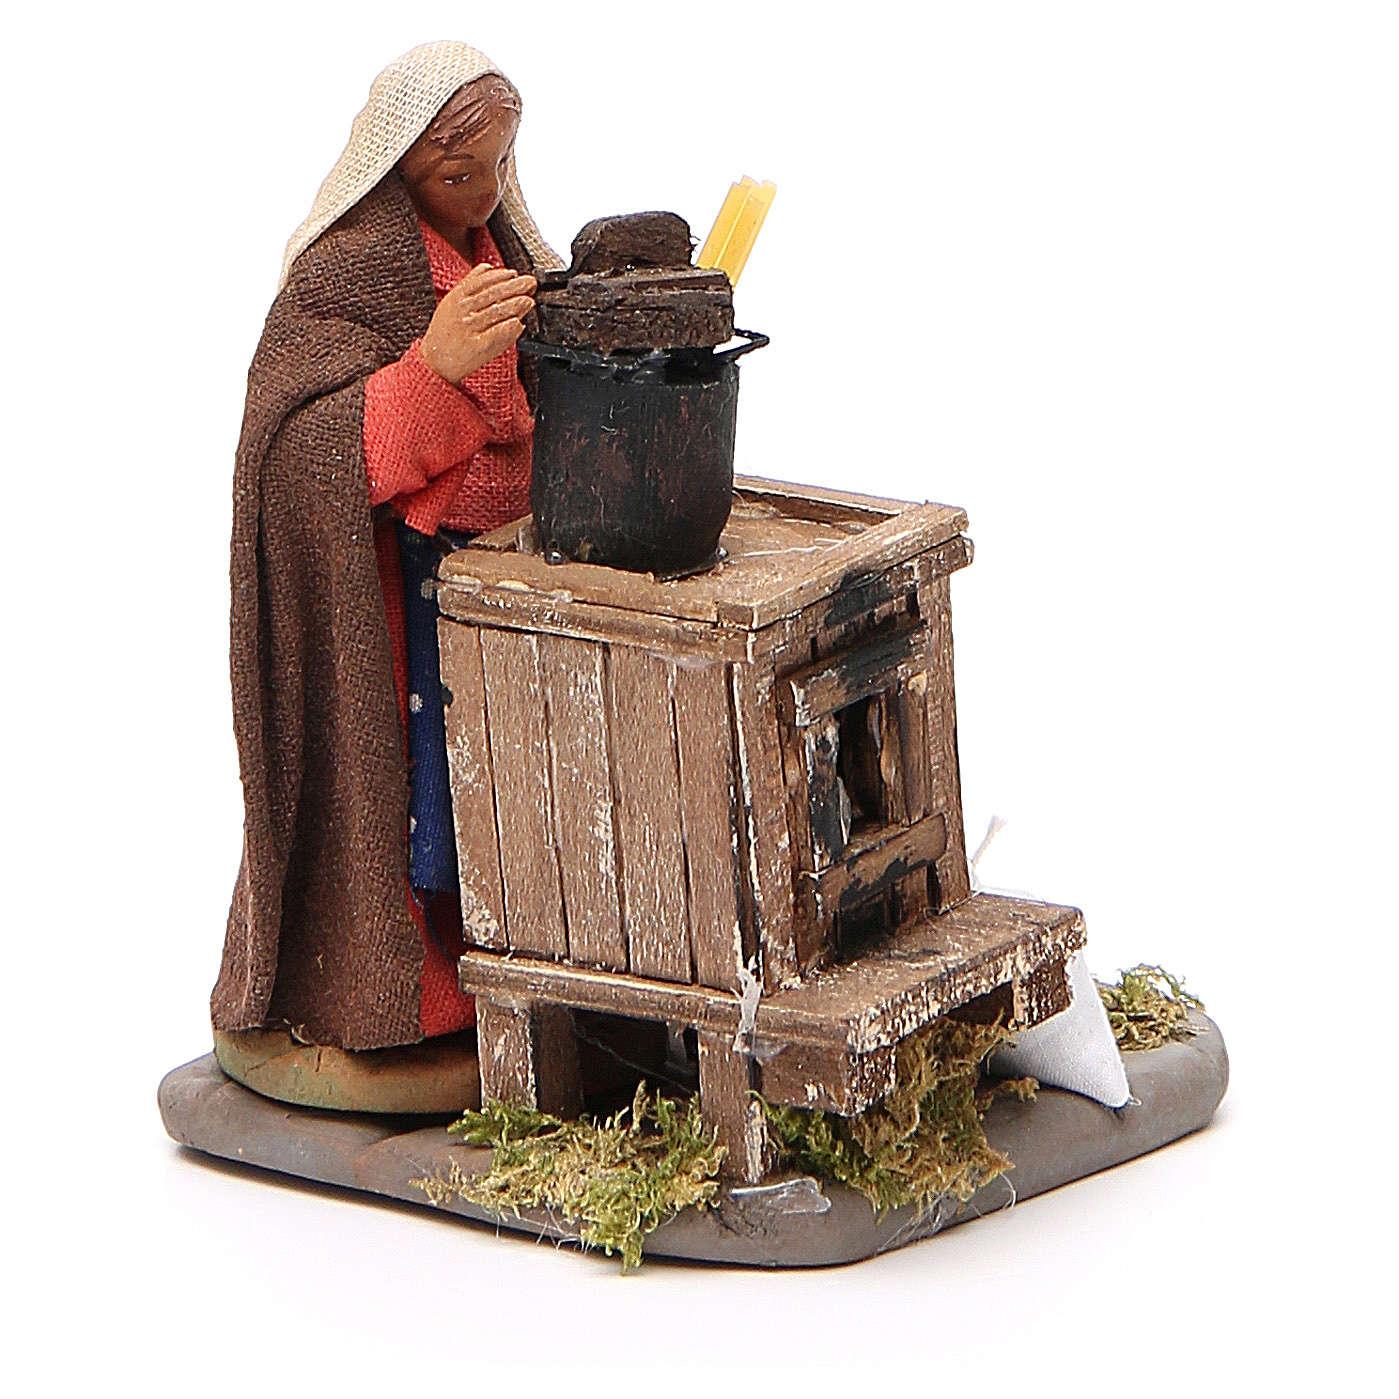 Woman with furnace, Neapolitan nativity figurine 10cm 4